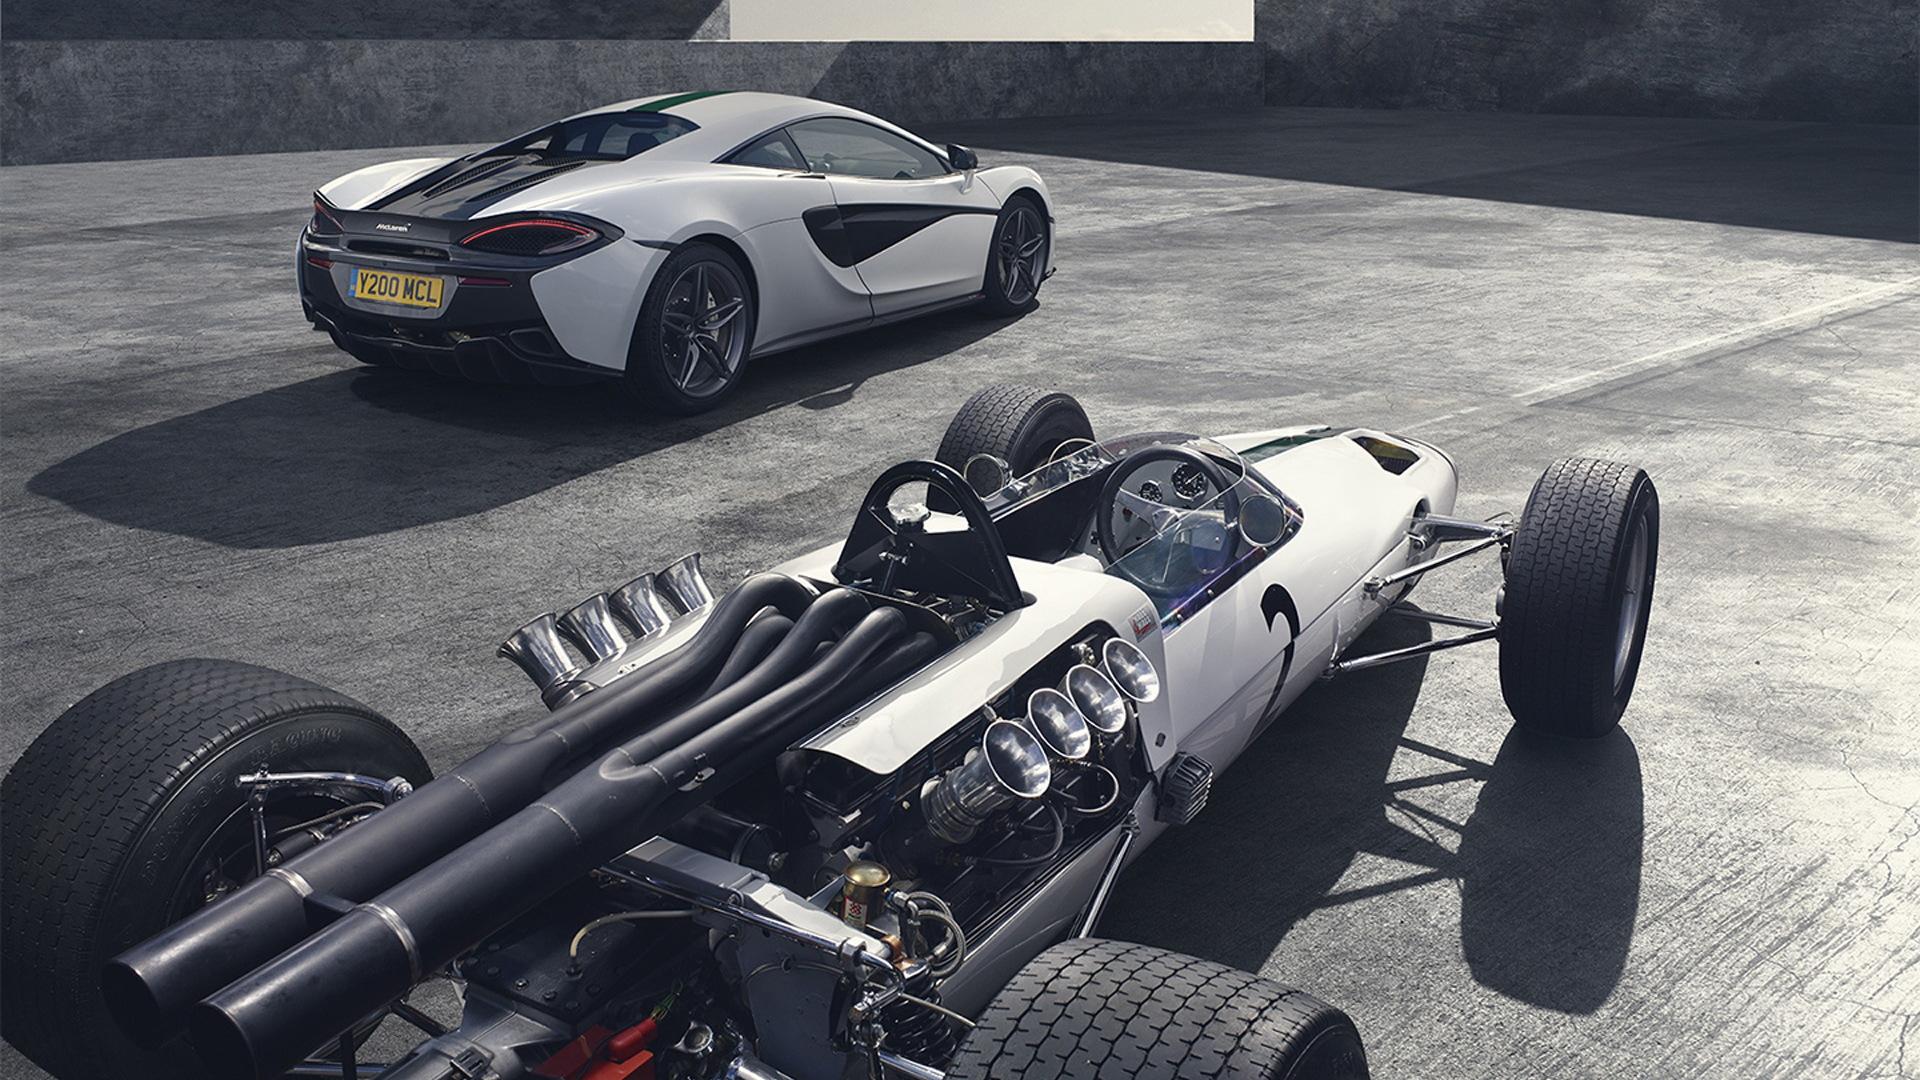 1966 McLaren M2B Formula One car and 2016 McLaren 570S